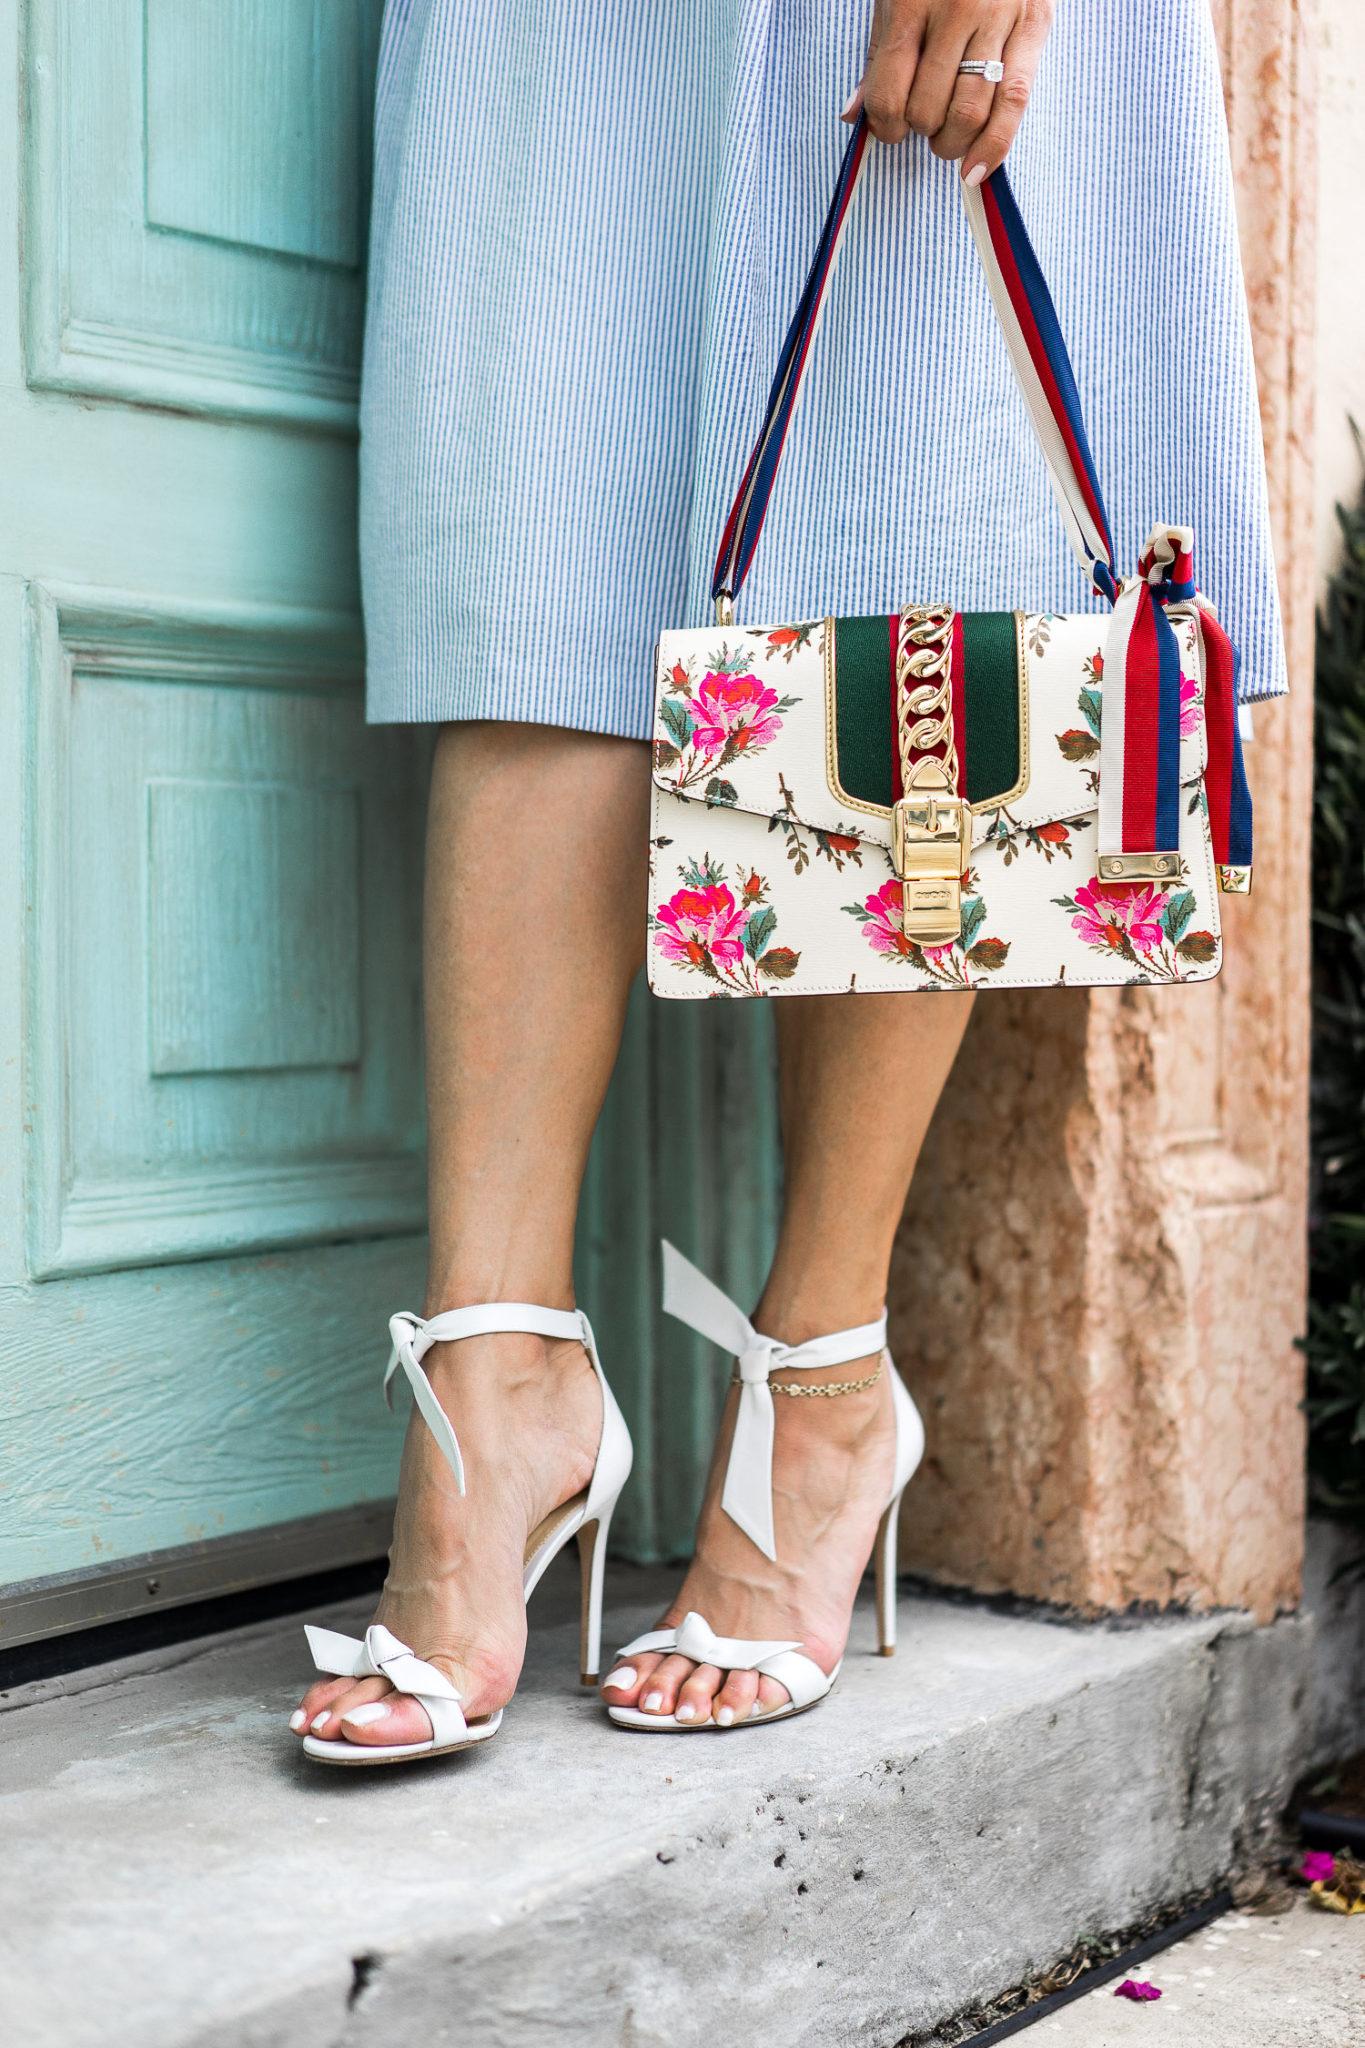 49f074275a4 talbots-seersucker-dress-gucci-sylvie-small-rose-floral-shoulder -bag-alexandre-birman-clarita-sandals-aglamlifestyle-palm-beach-style